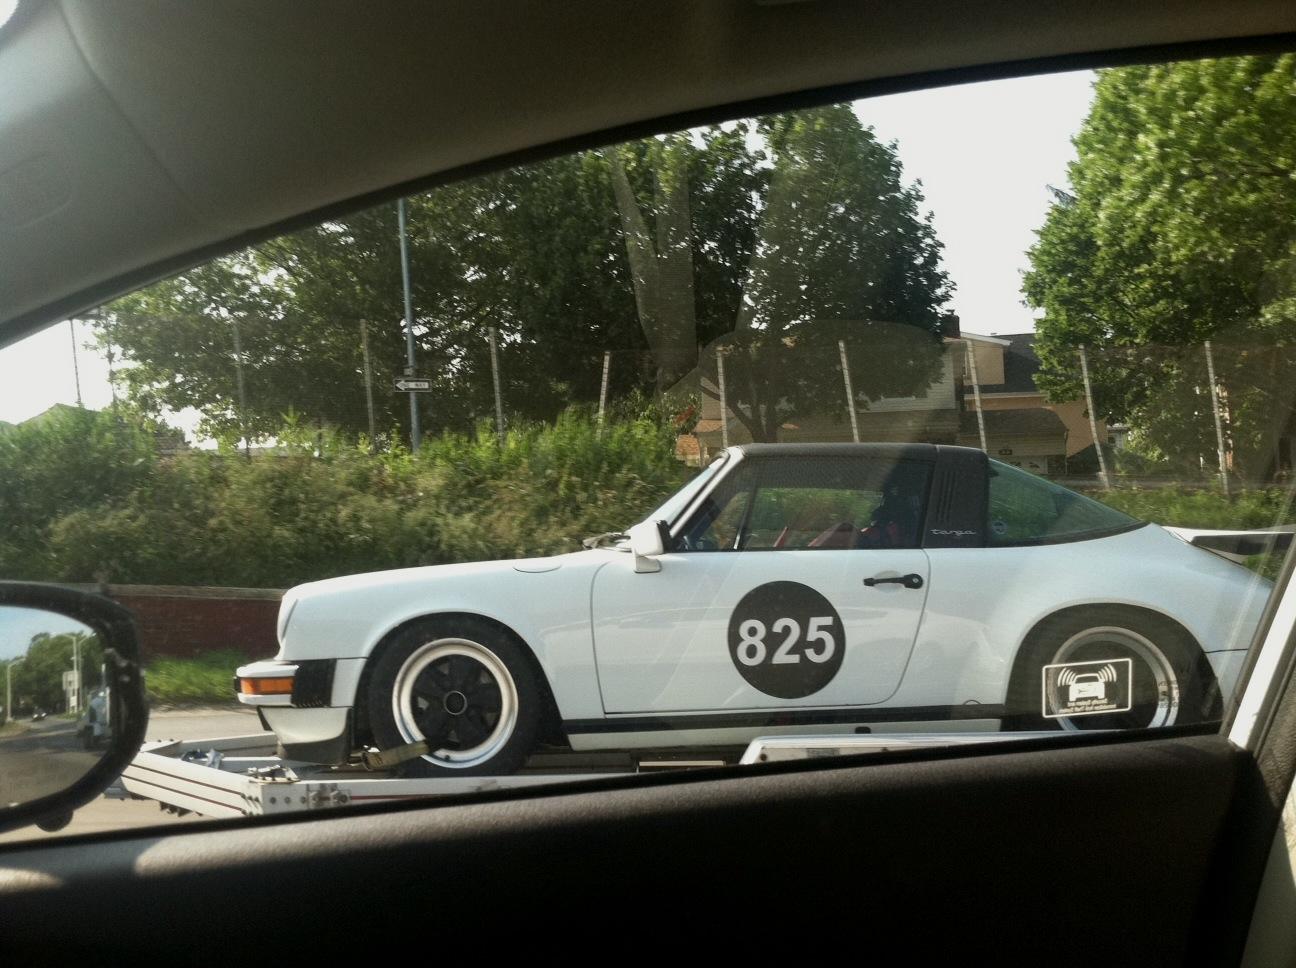 porsche 911 gt3 | IEDEI on laferrari on track, mclaren p1 on track, lotus exige on track, audi r8 on track, bugatti veyron on track, maserati mc12 on track, mclaren f1 on track, ford gt40 on track, hyundai genesis coupe on track, pagani zonda on track, lamborghini aventador on track, jeep wrangler on track, ford gt on track, lamborghini diablo on track, dodge viper on track, ferrari testarossa on track, hennessey venom gt on track, lamborghini gallardo on track, lamborghini sesto elemento on track, ferrari mondial on track,